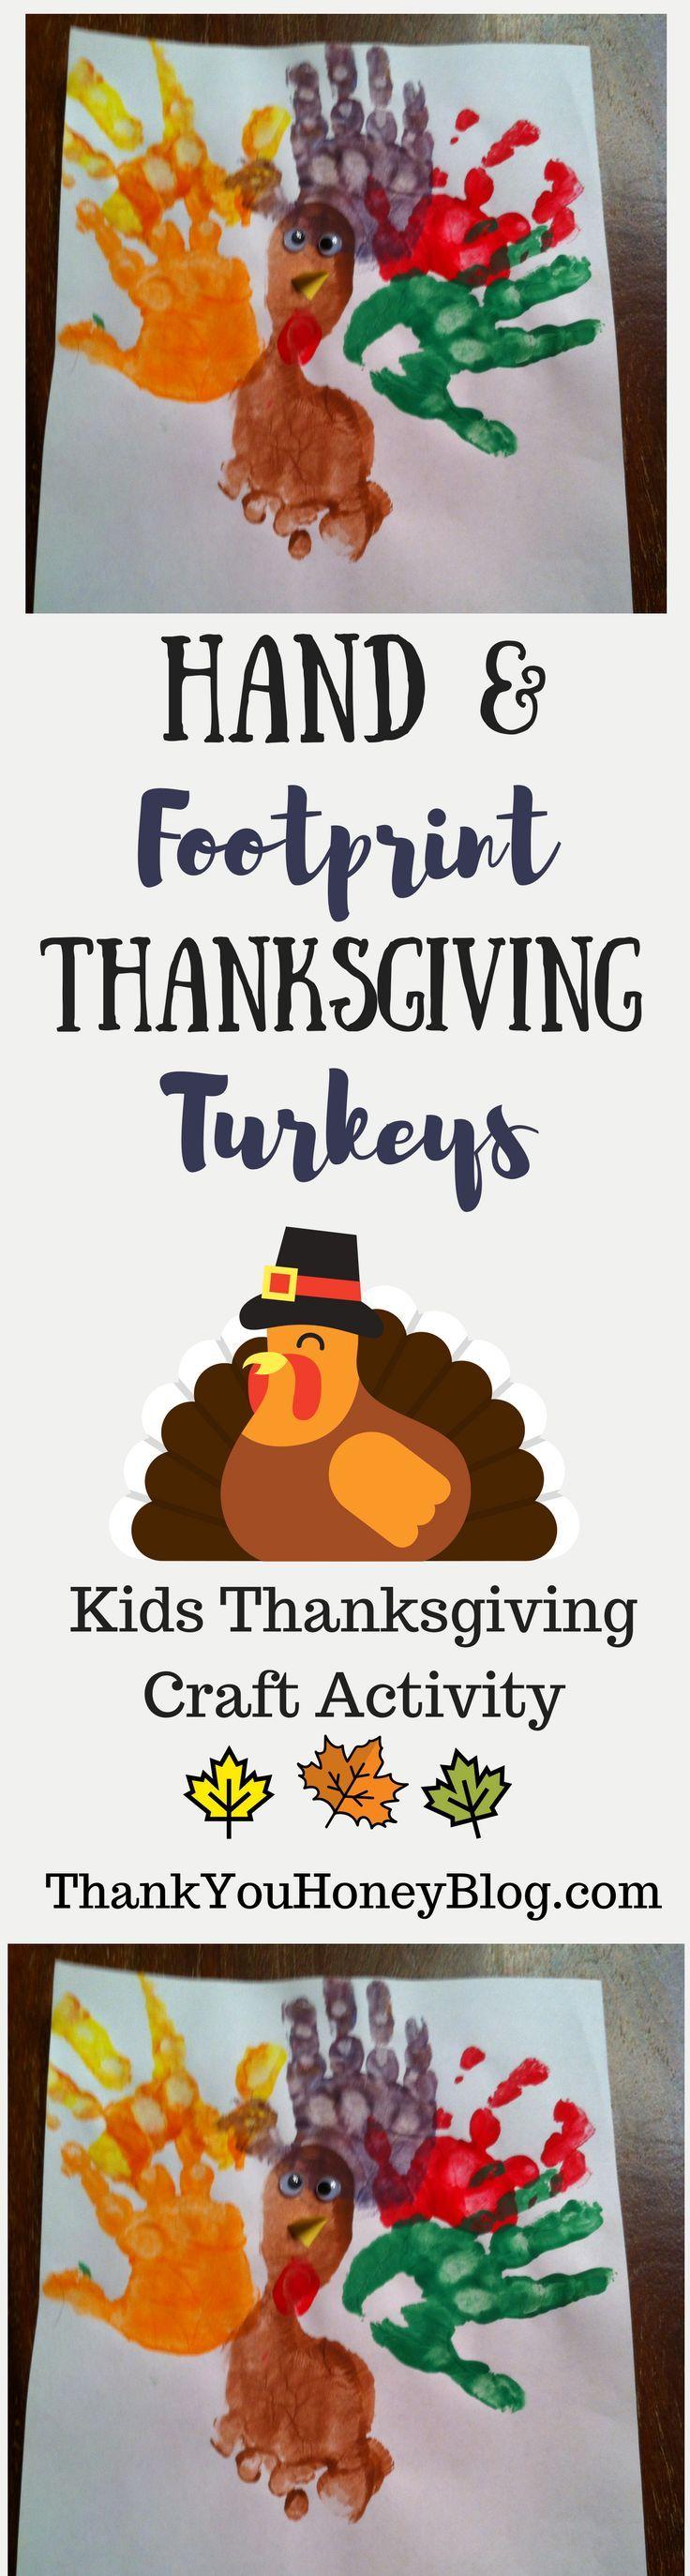 Hand & Footprint Thanksgiving Turkeys crafts. Click through & PIN IT! Follow Us on Pinterest + Subscribe to ThankYouHoneyBlog.com, DIY, Hand & Foot Print Turkeys, kids activity, Thanksgiving, Thanksgiving Kids Craft, Turkey Craft, Turkey Day, Tutorial